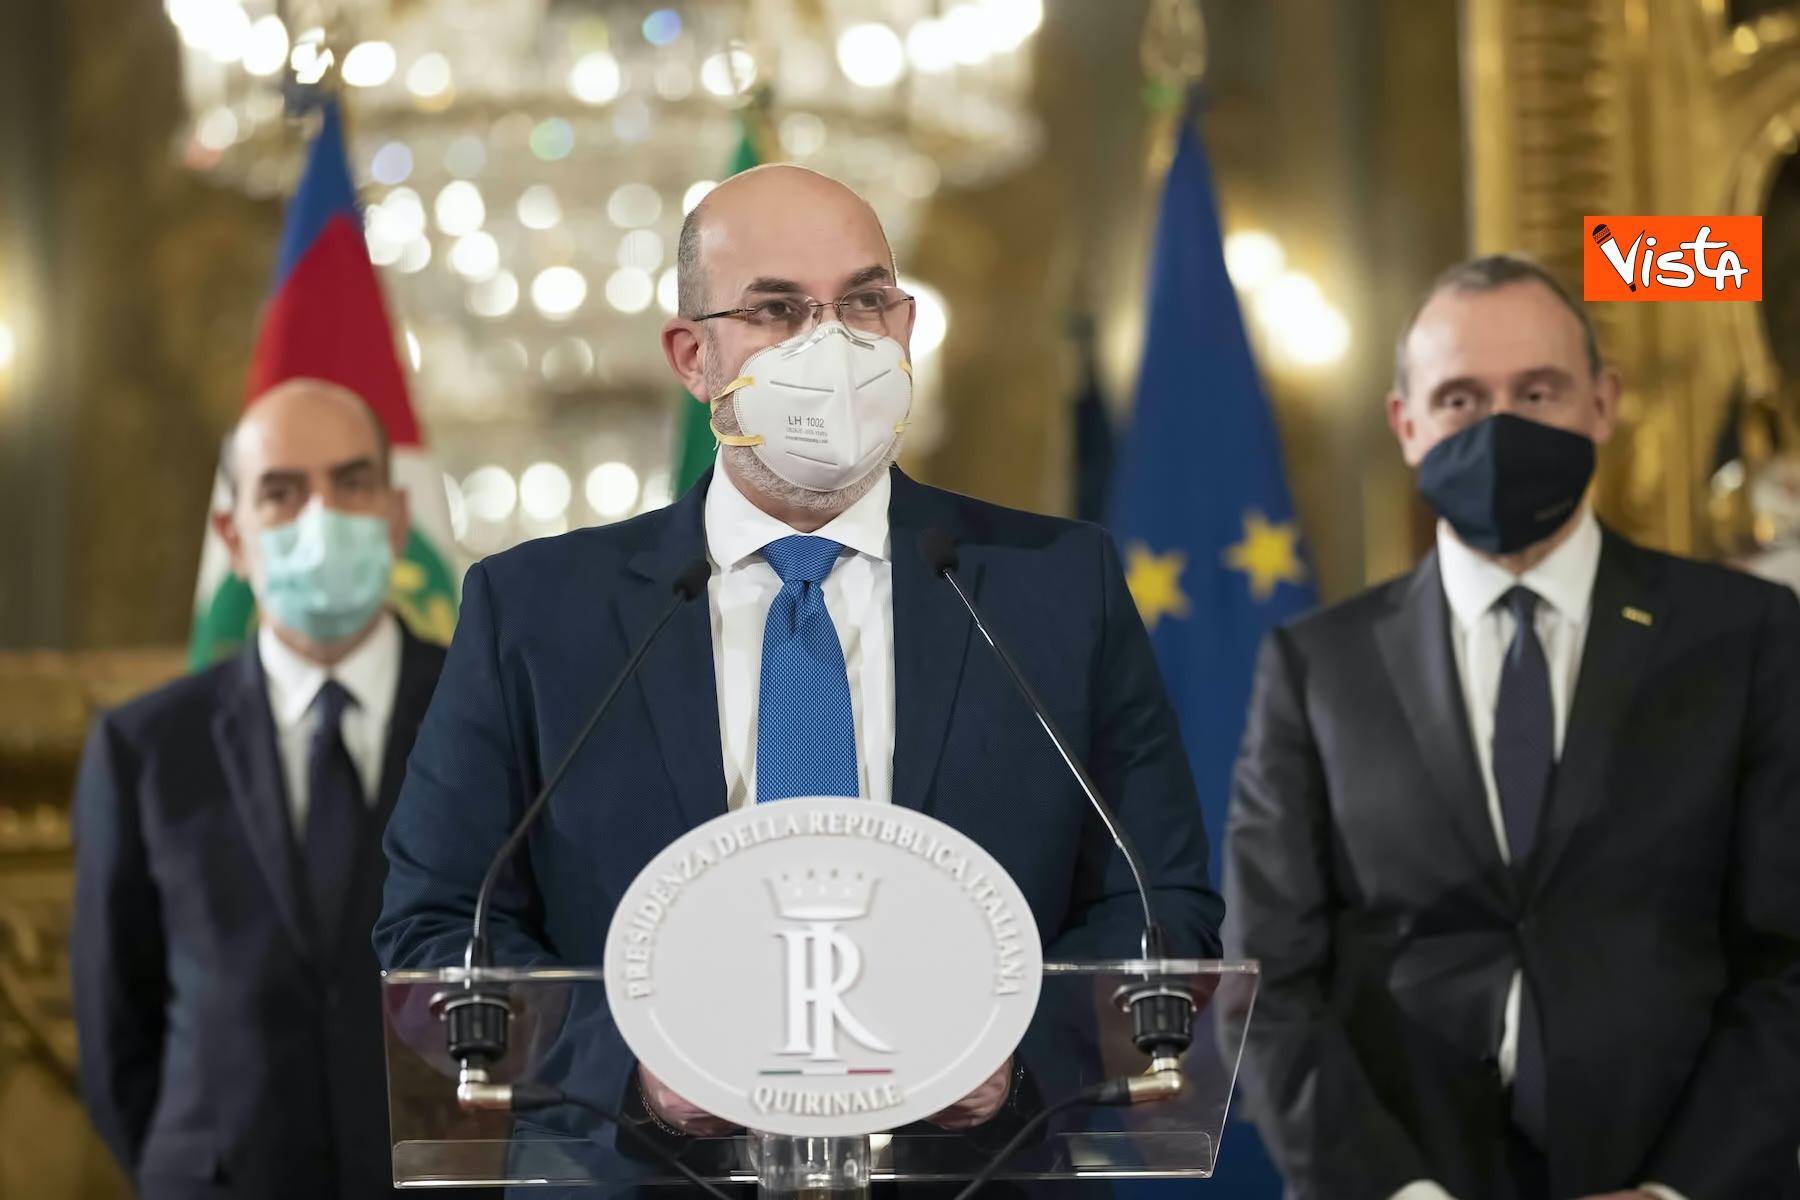 29-01 consultazioni crimi m5s italiani stufi dei teatrini_05